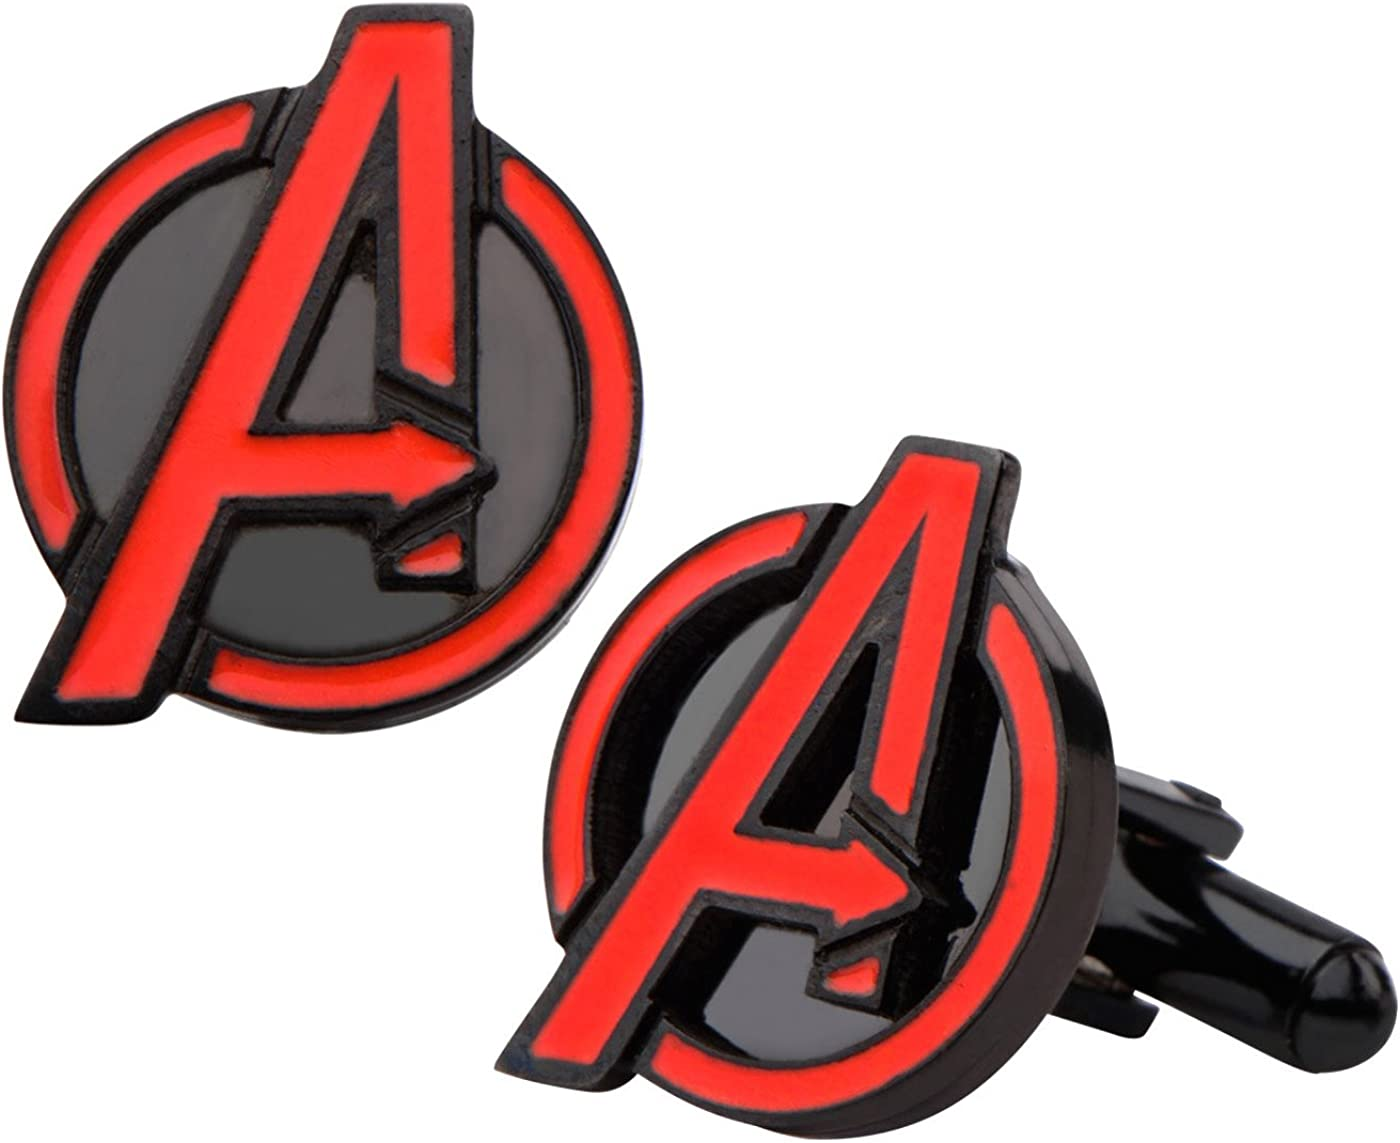 INOX Marvel Avengers Age of Ultron Avengers Logo Stainless Steel Cufflinks